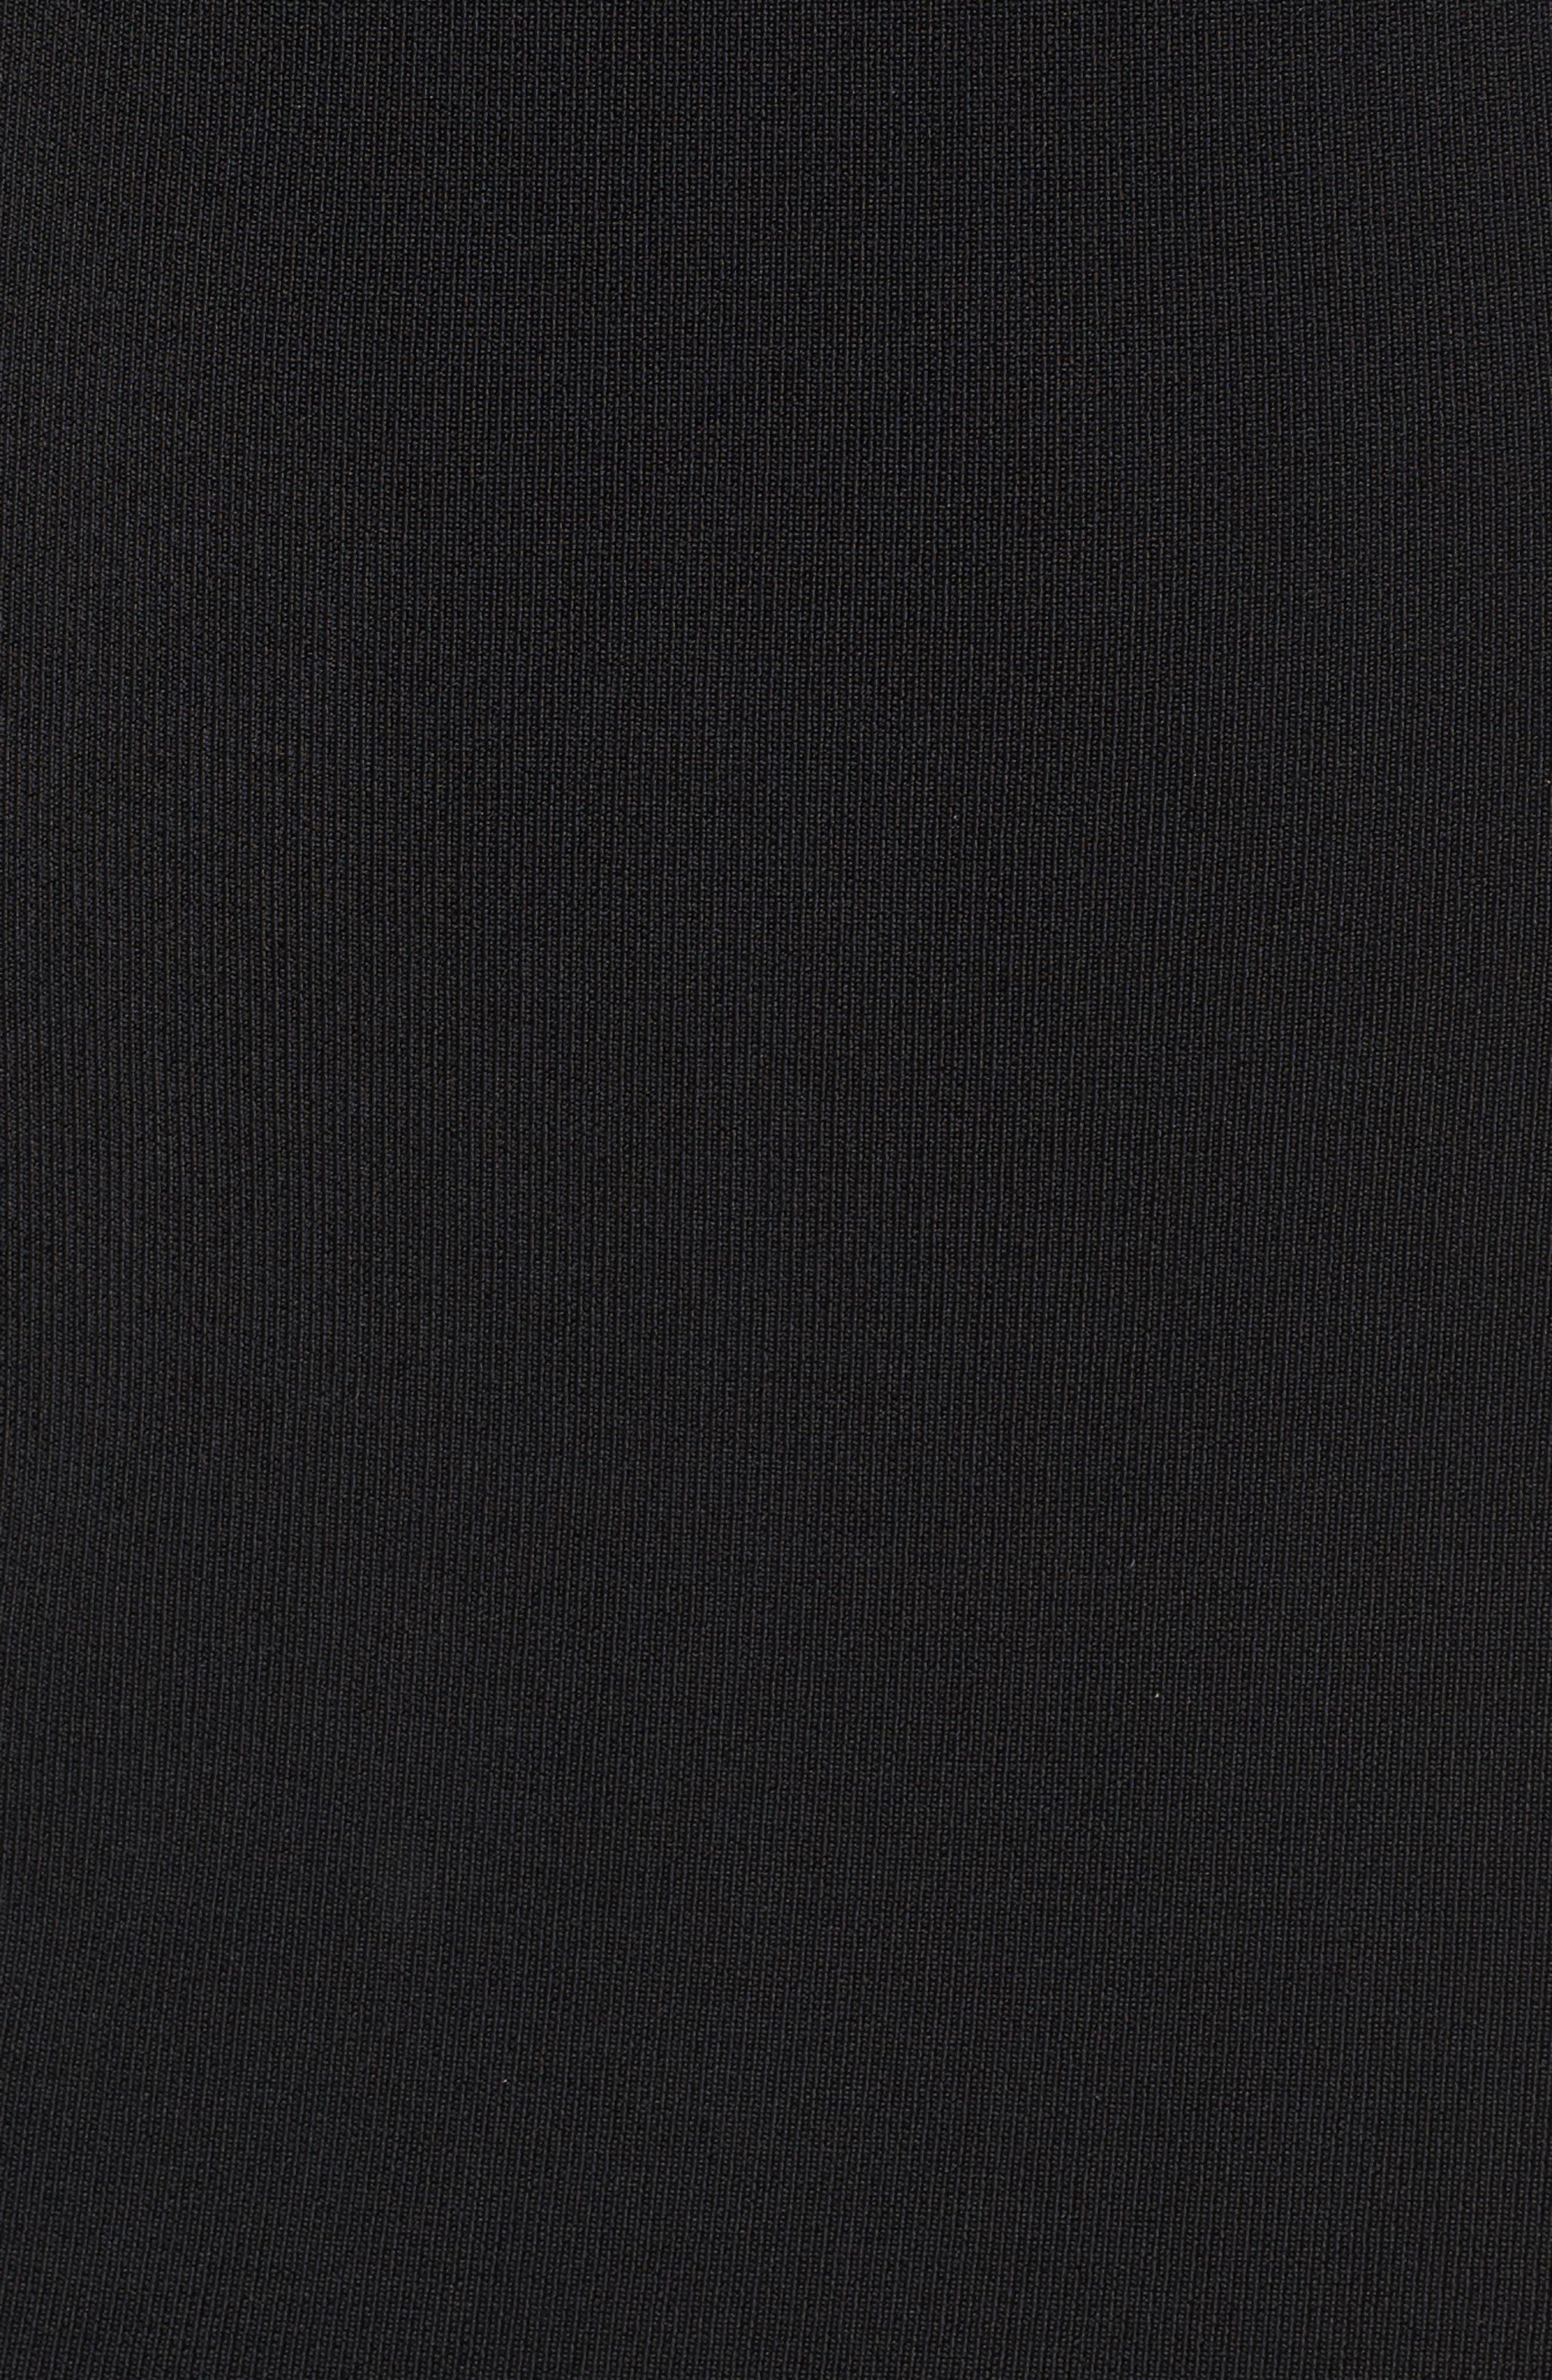 Halter Keyhole Sweater Dress,                             Alternate thumbnail 5, color,                             001